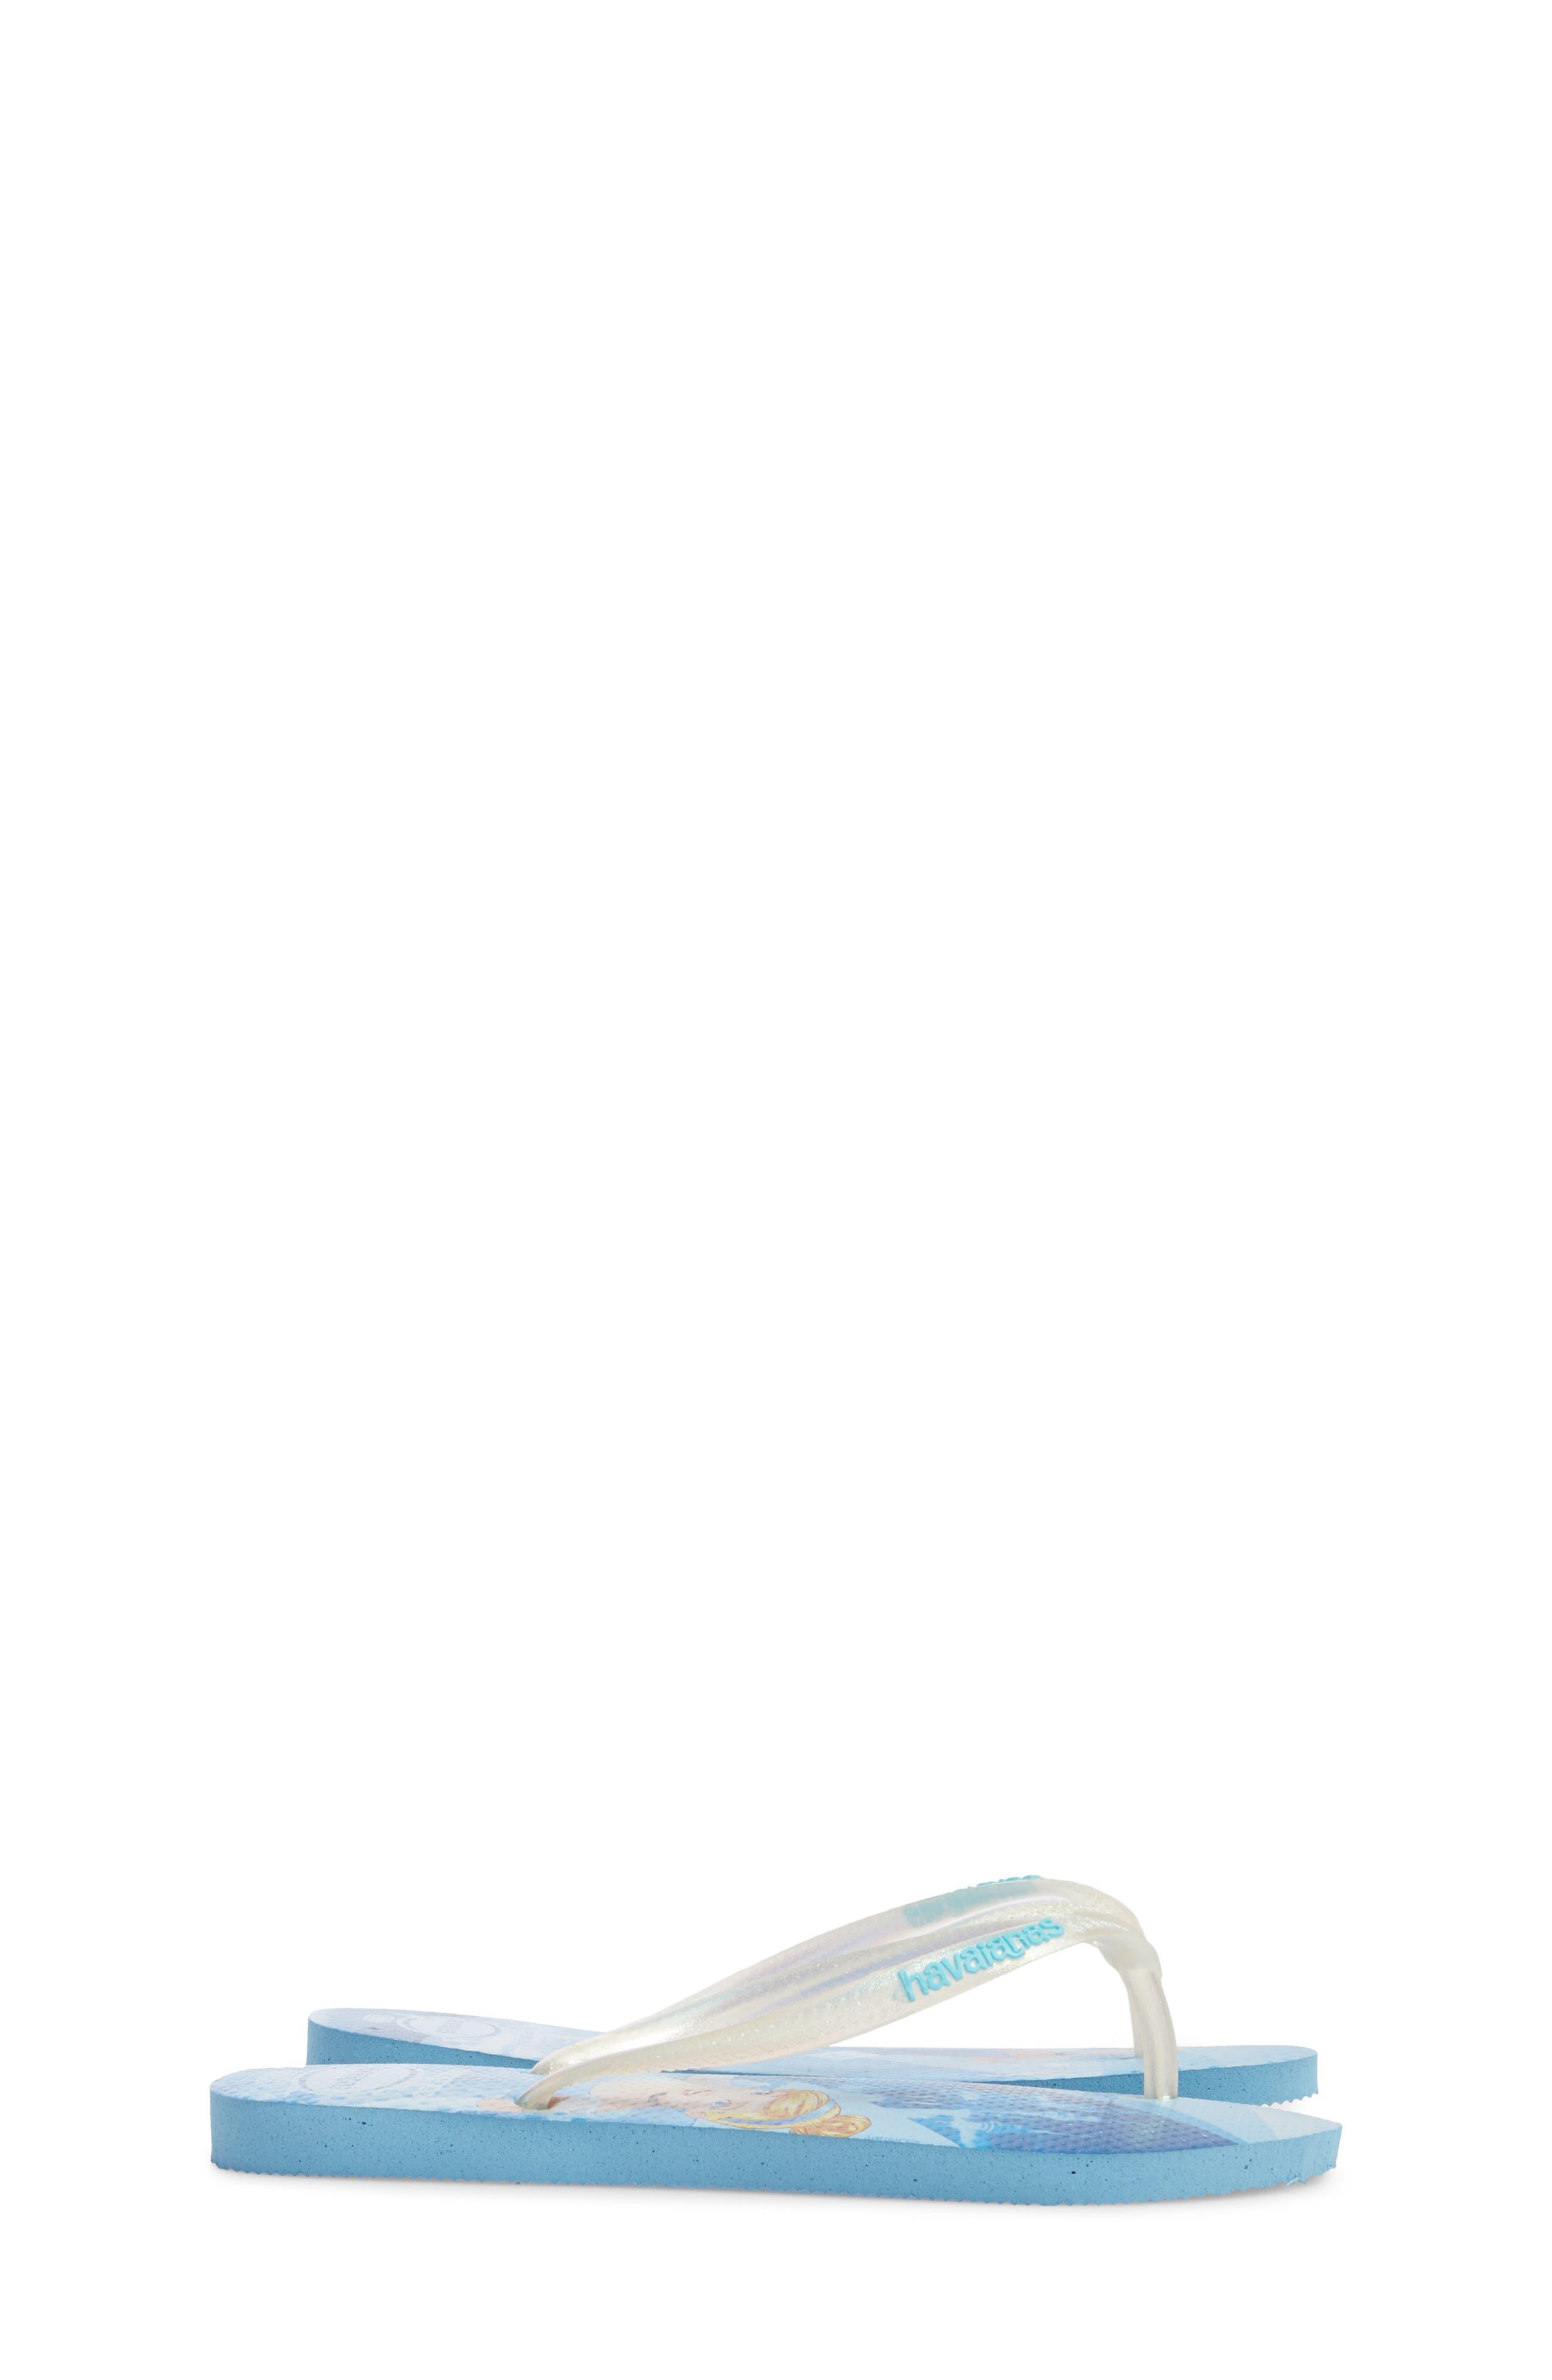 'Disney Princess' Flip Flops,                             Alternate thumbnail 4, color,                             Blue Splash